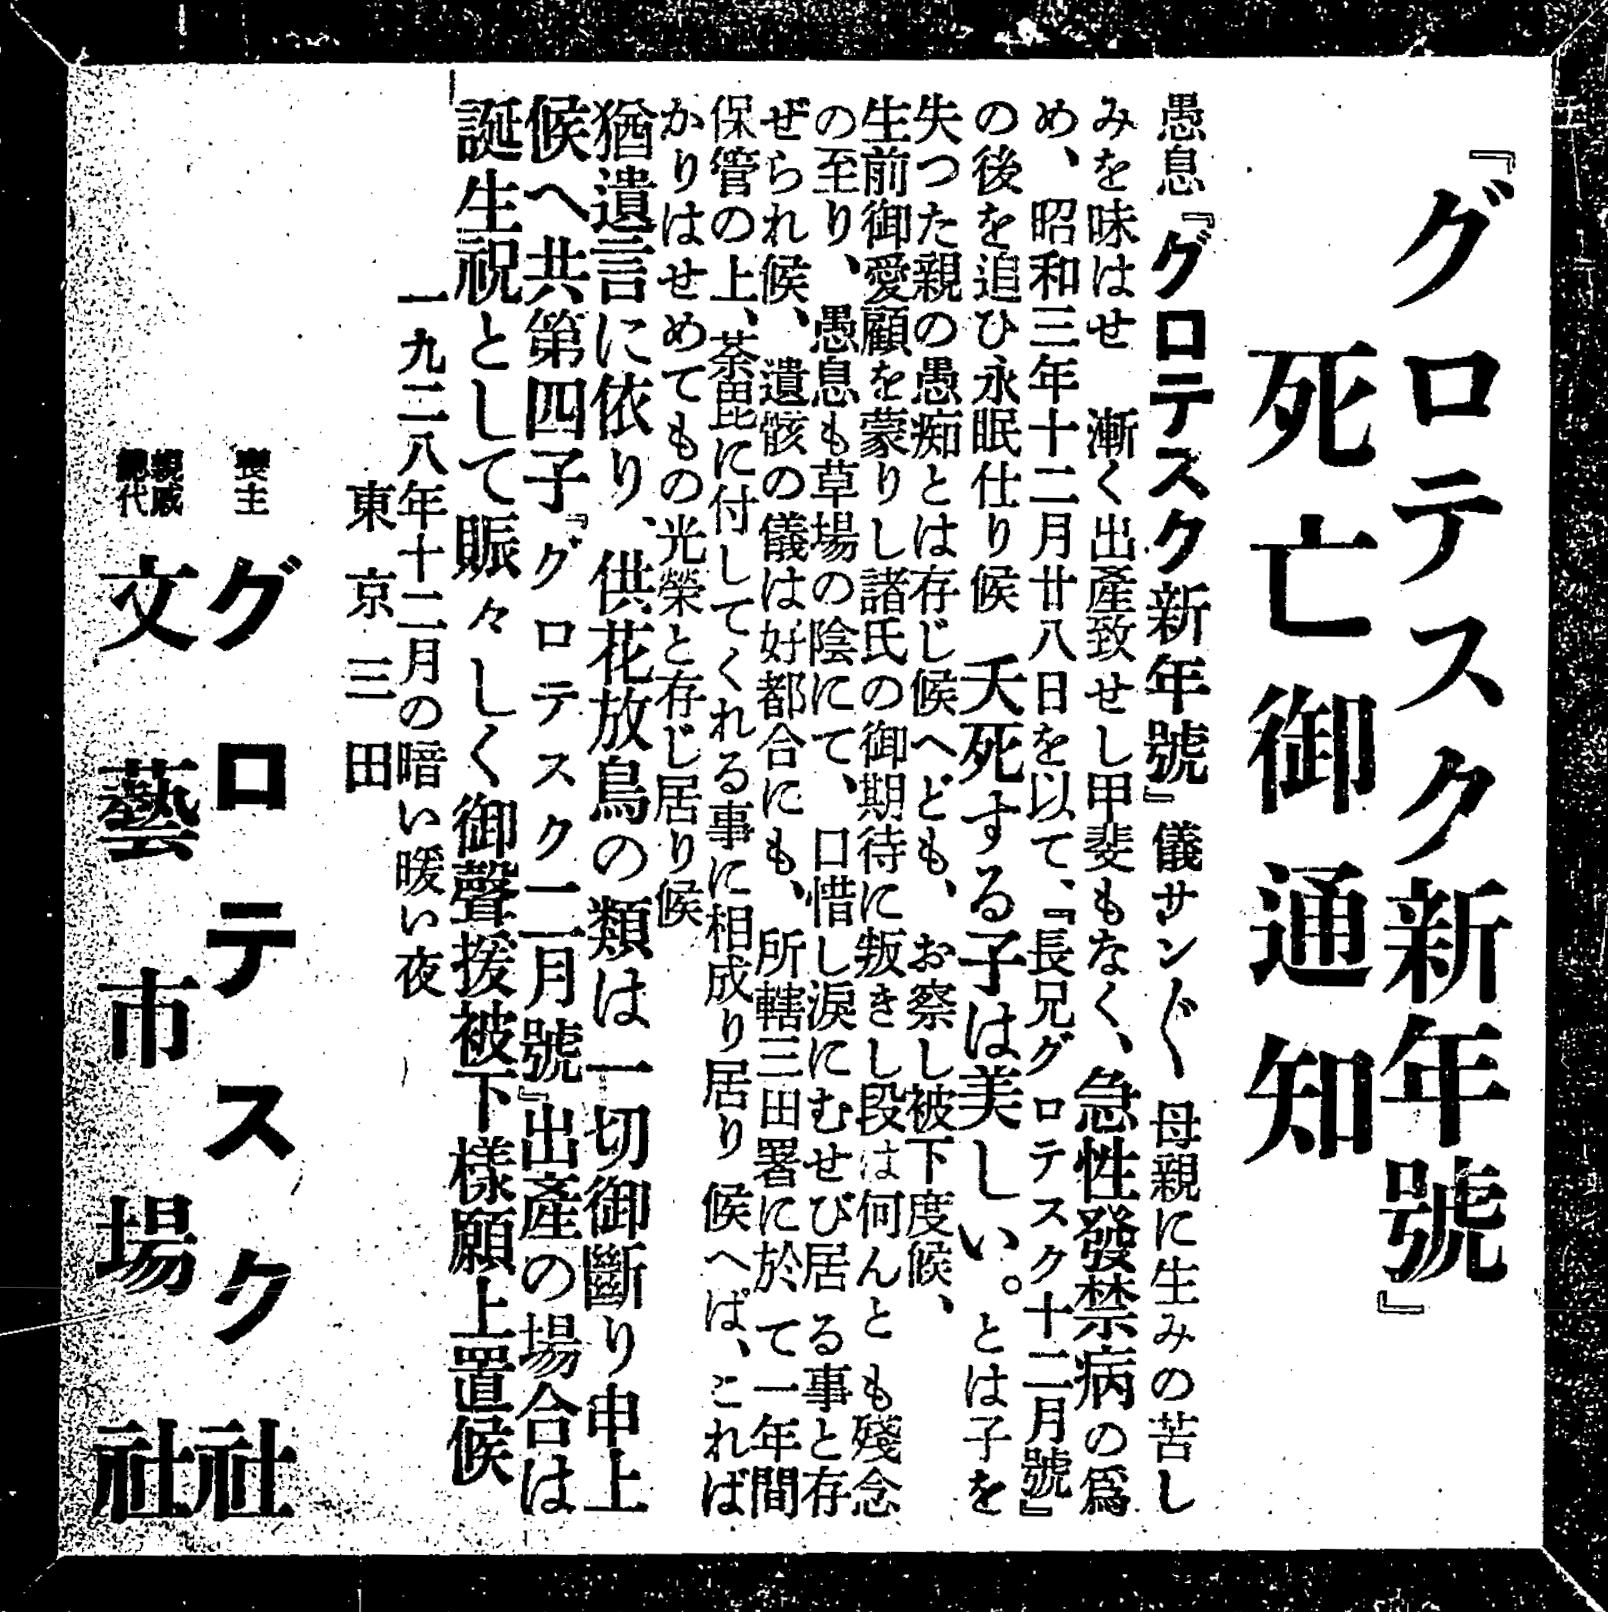 f:id:kougasetumei:20191201005229p:image